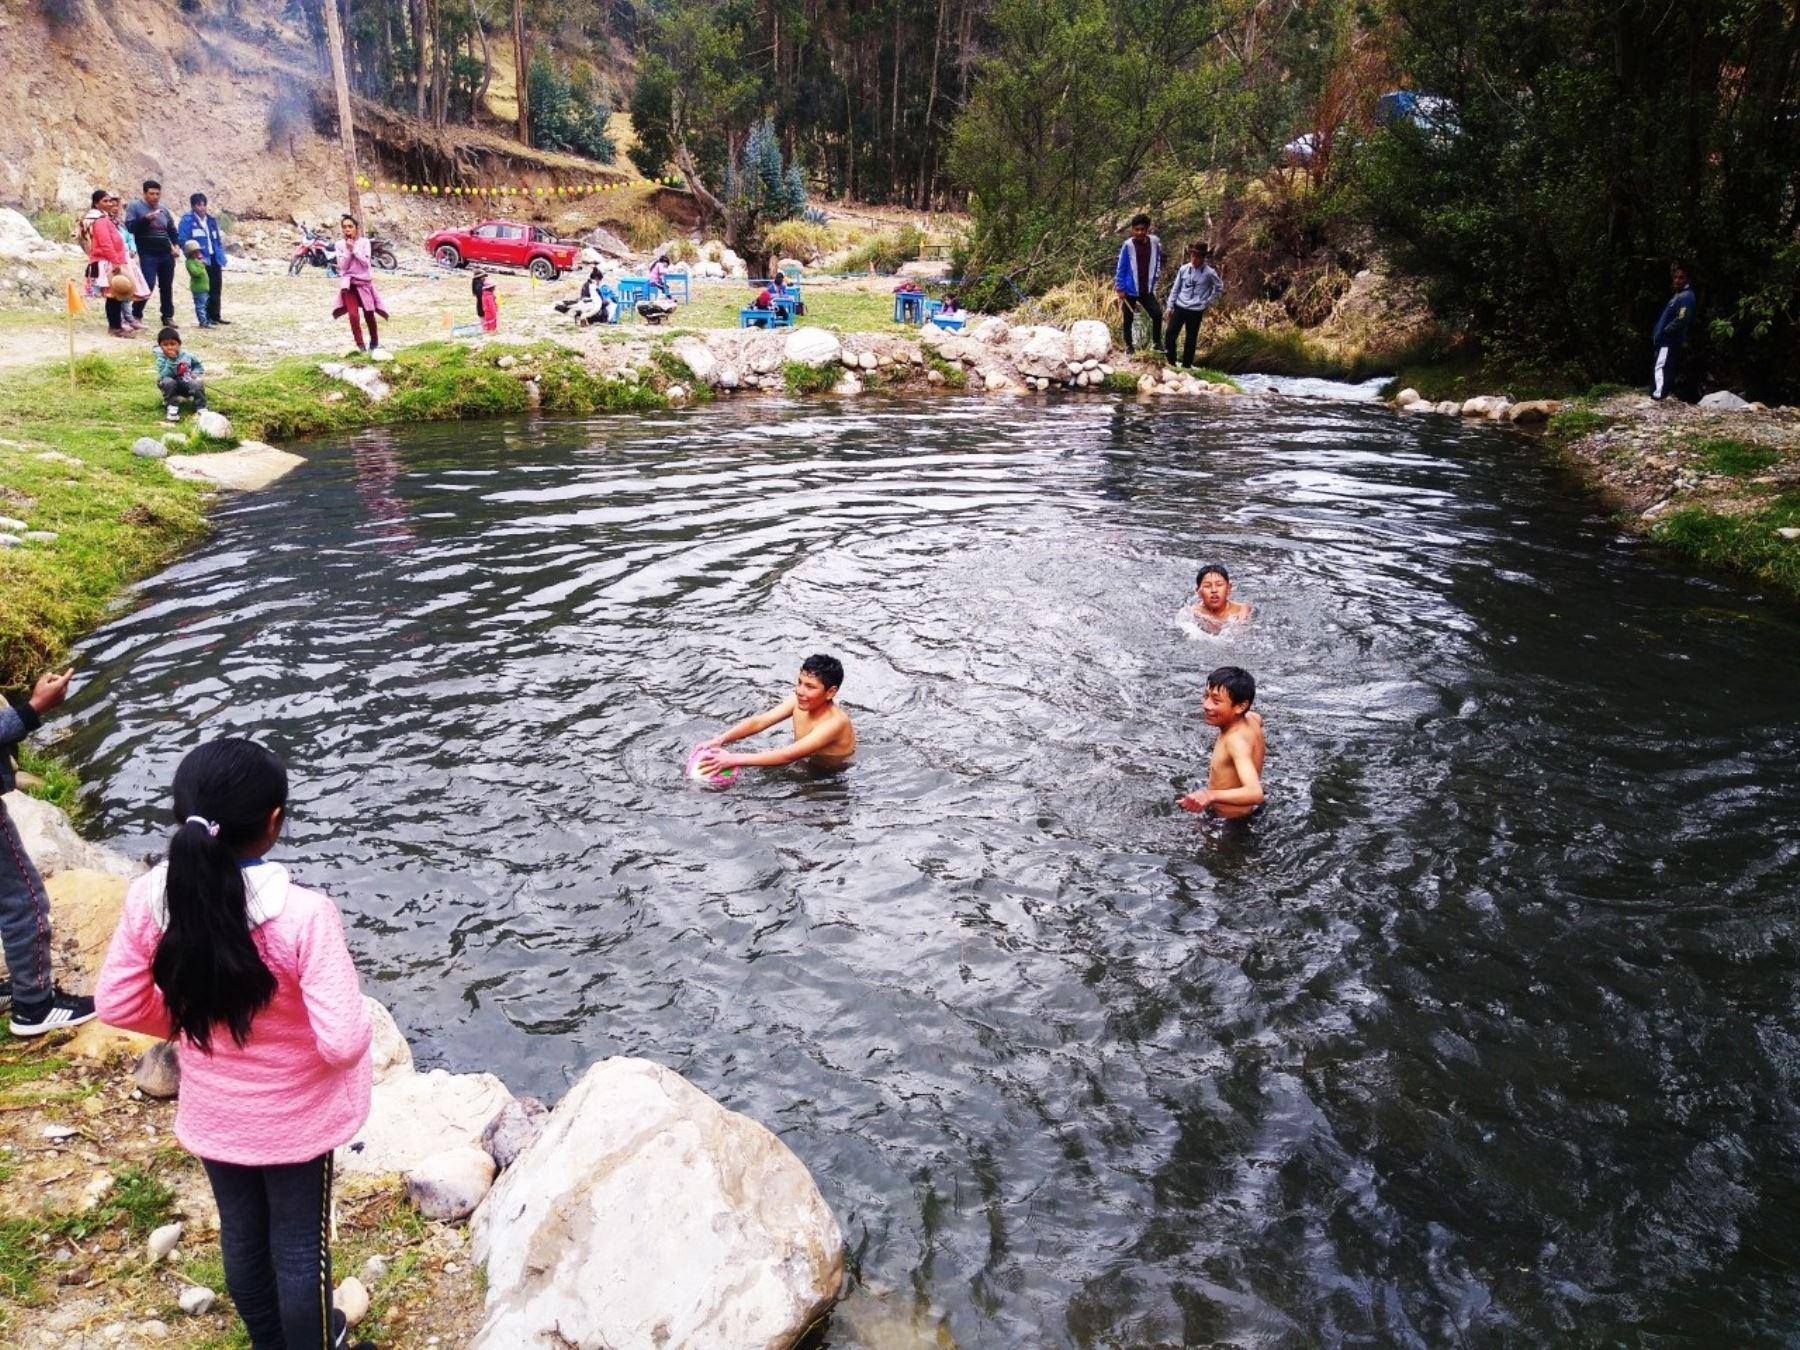 Huancayo: centro turístico del distrito de Huasicancha está listo para recibir a turistas